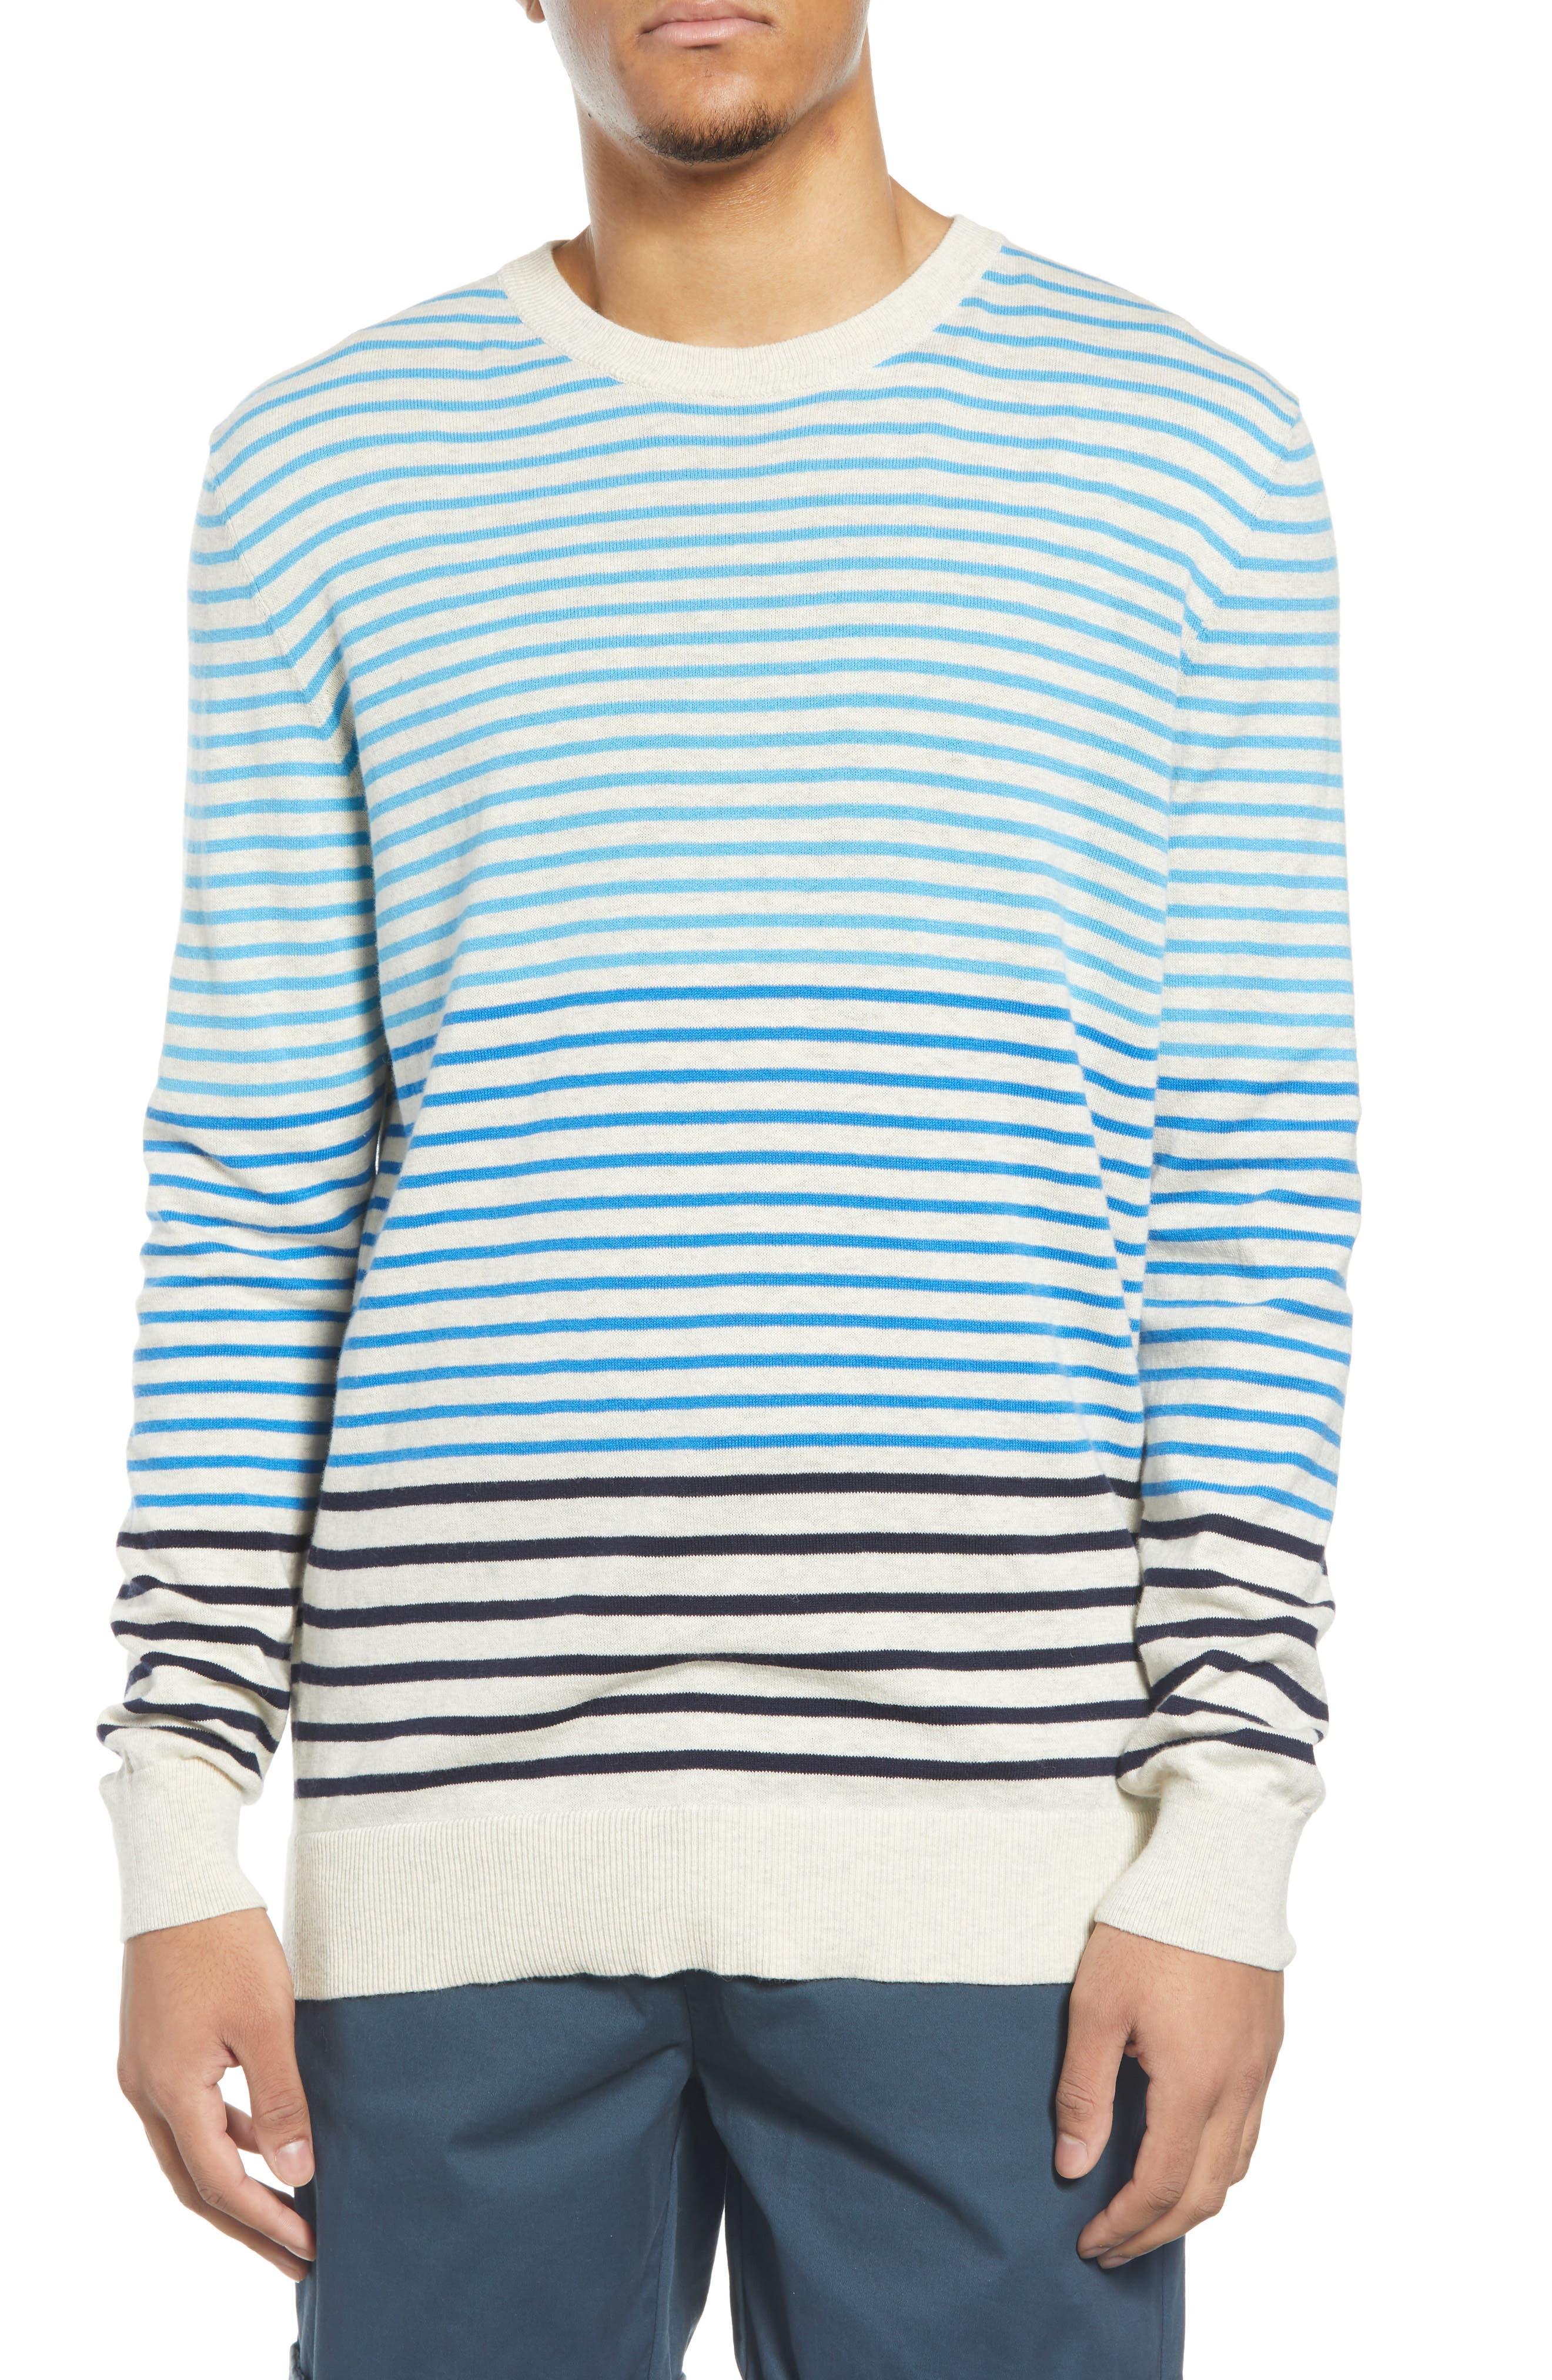 Scotch /& Soda Stripe Crewneck Sweater